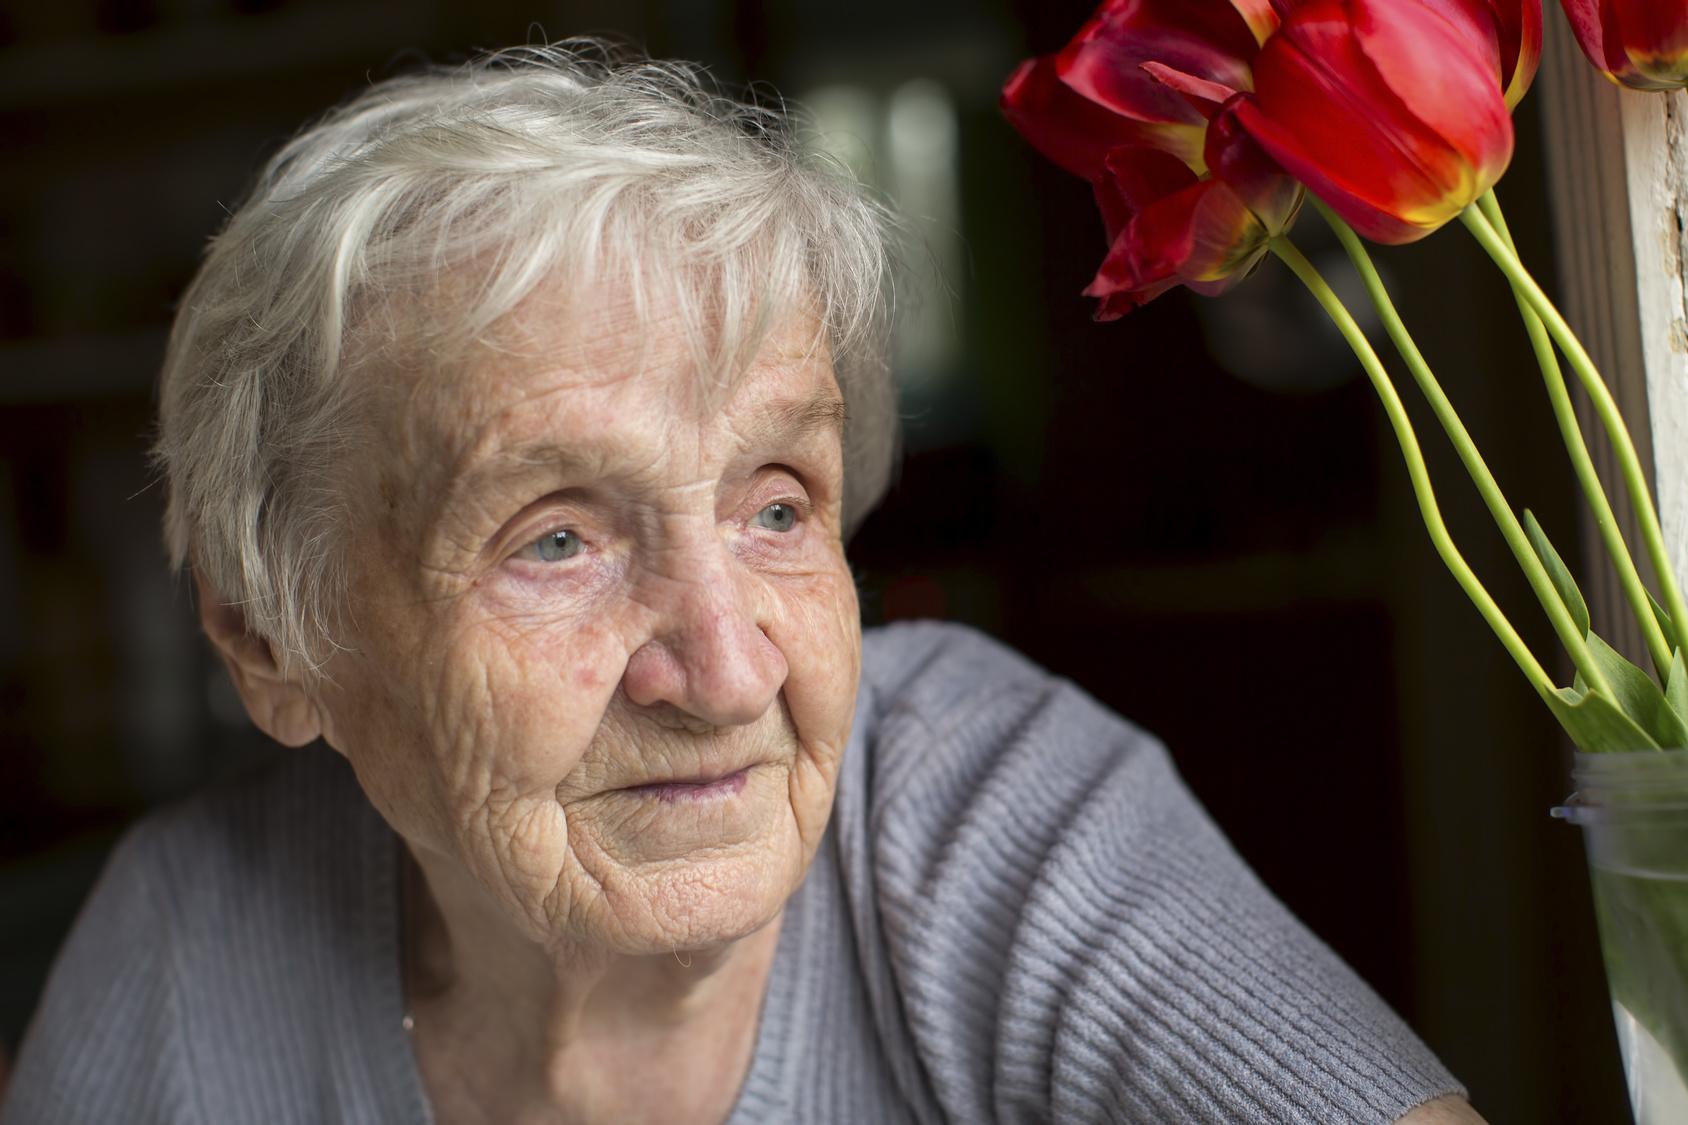 Close-up portrait of an elderly woman.